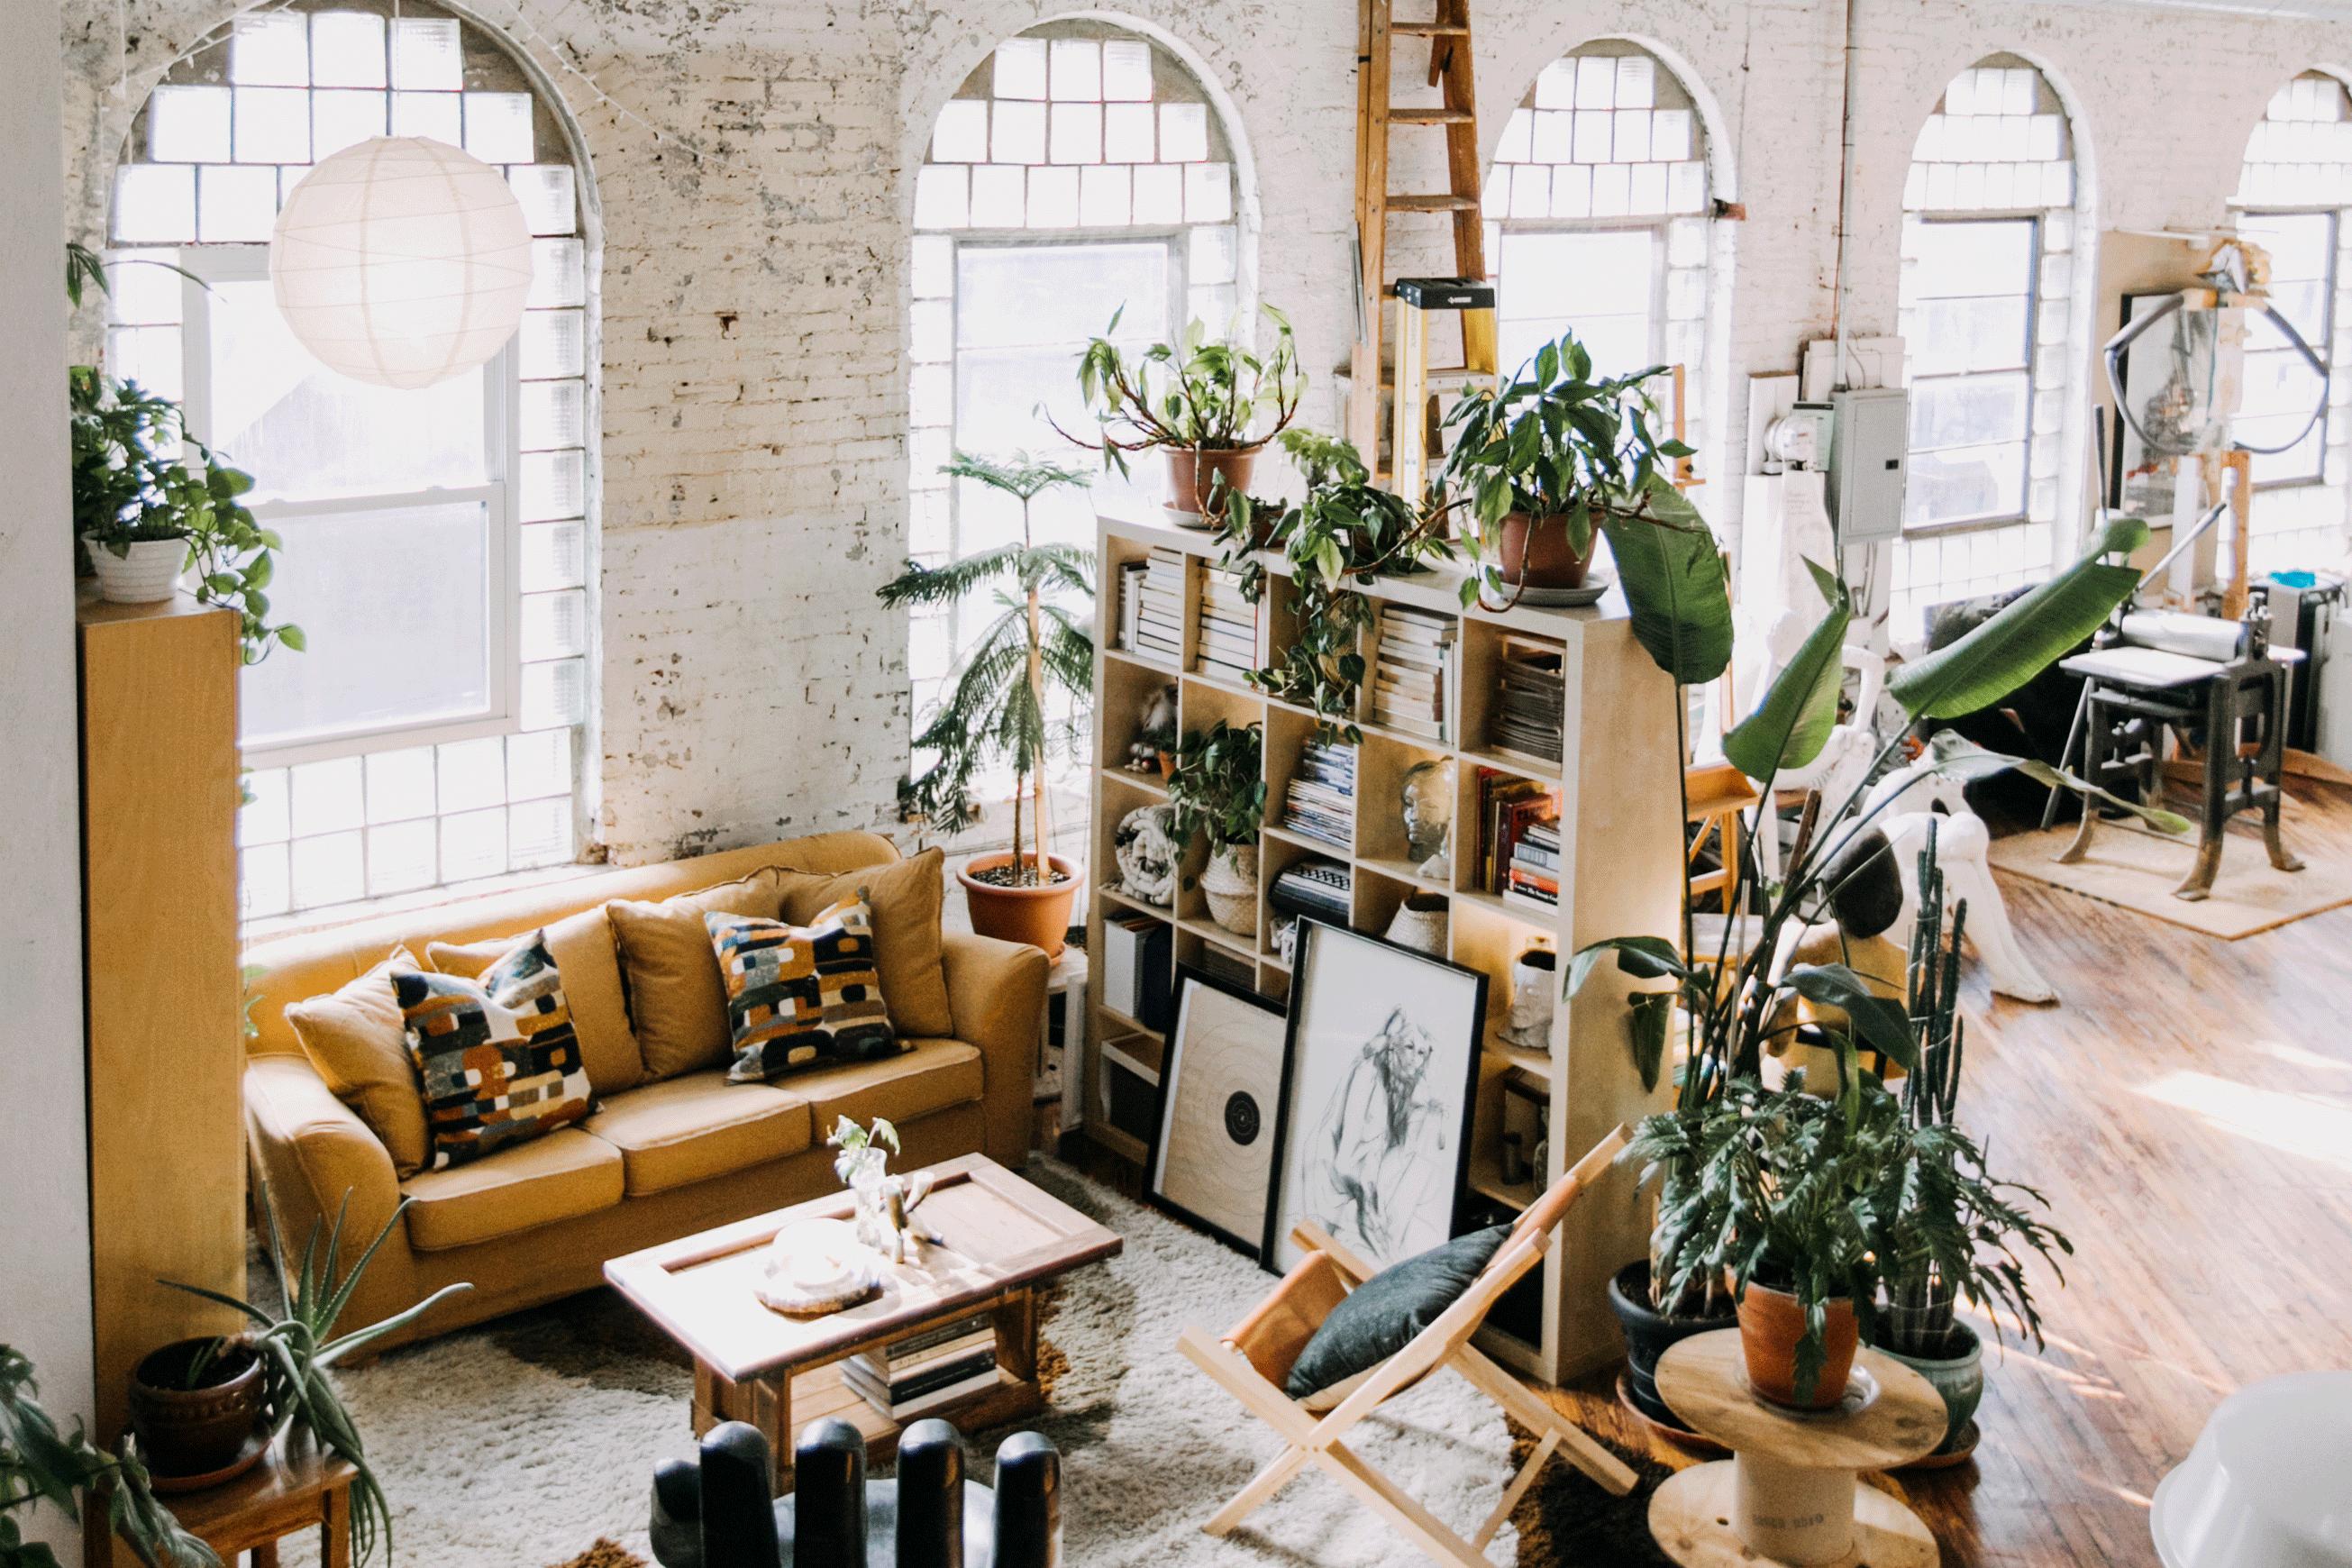 House Tour: A Loft Apartment in a Old Textile Factory ...